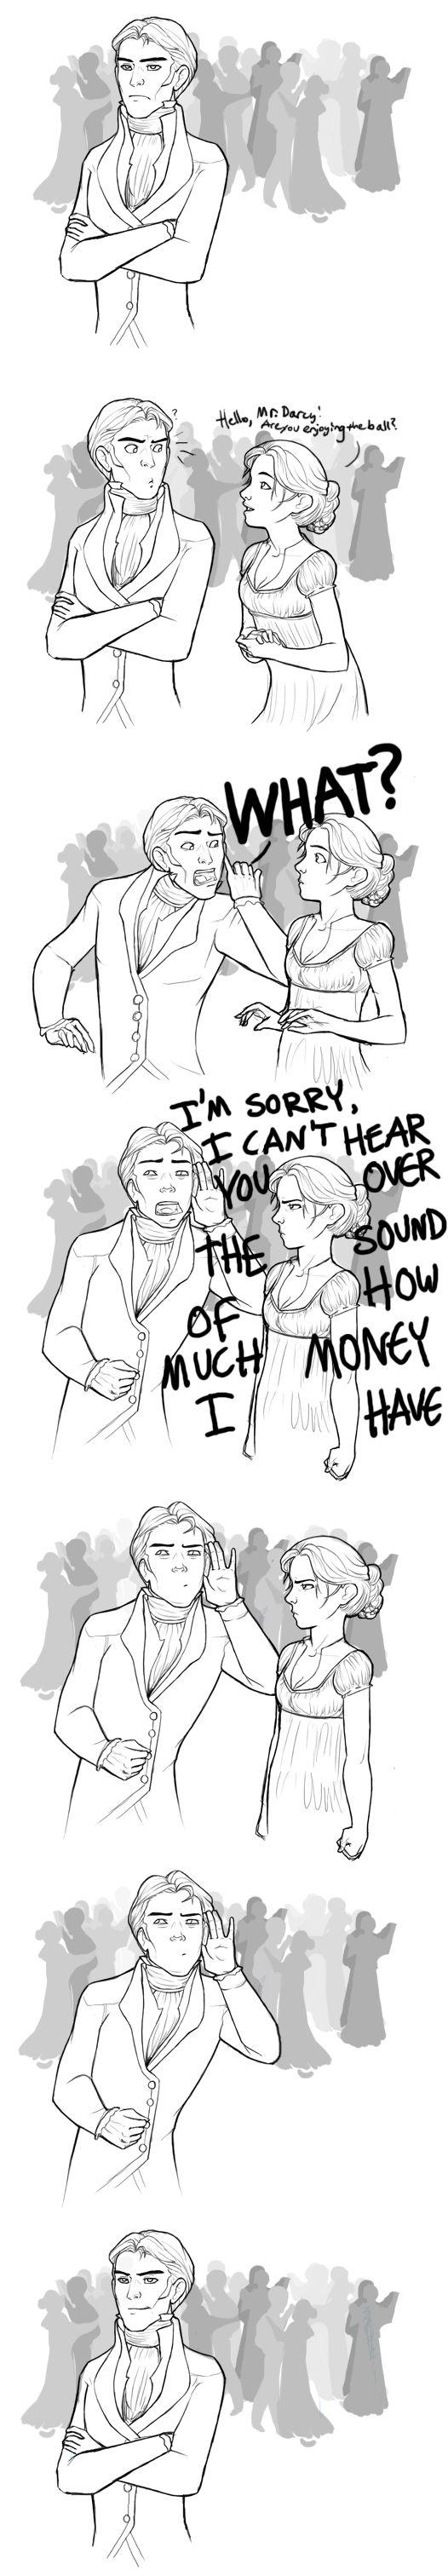 Pride and Prejudice- Mr. Darcy by wegs.deviantart.com I love Mr. Darcy.